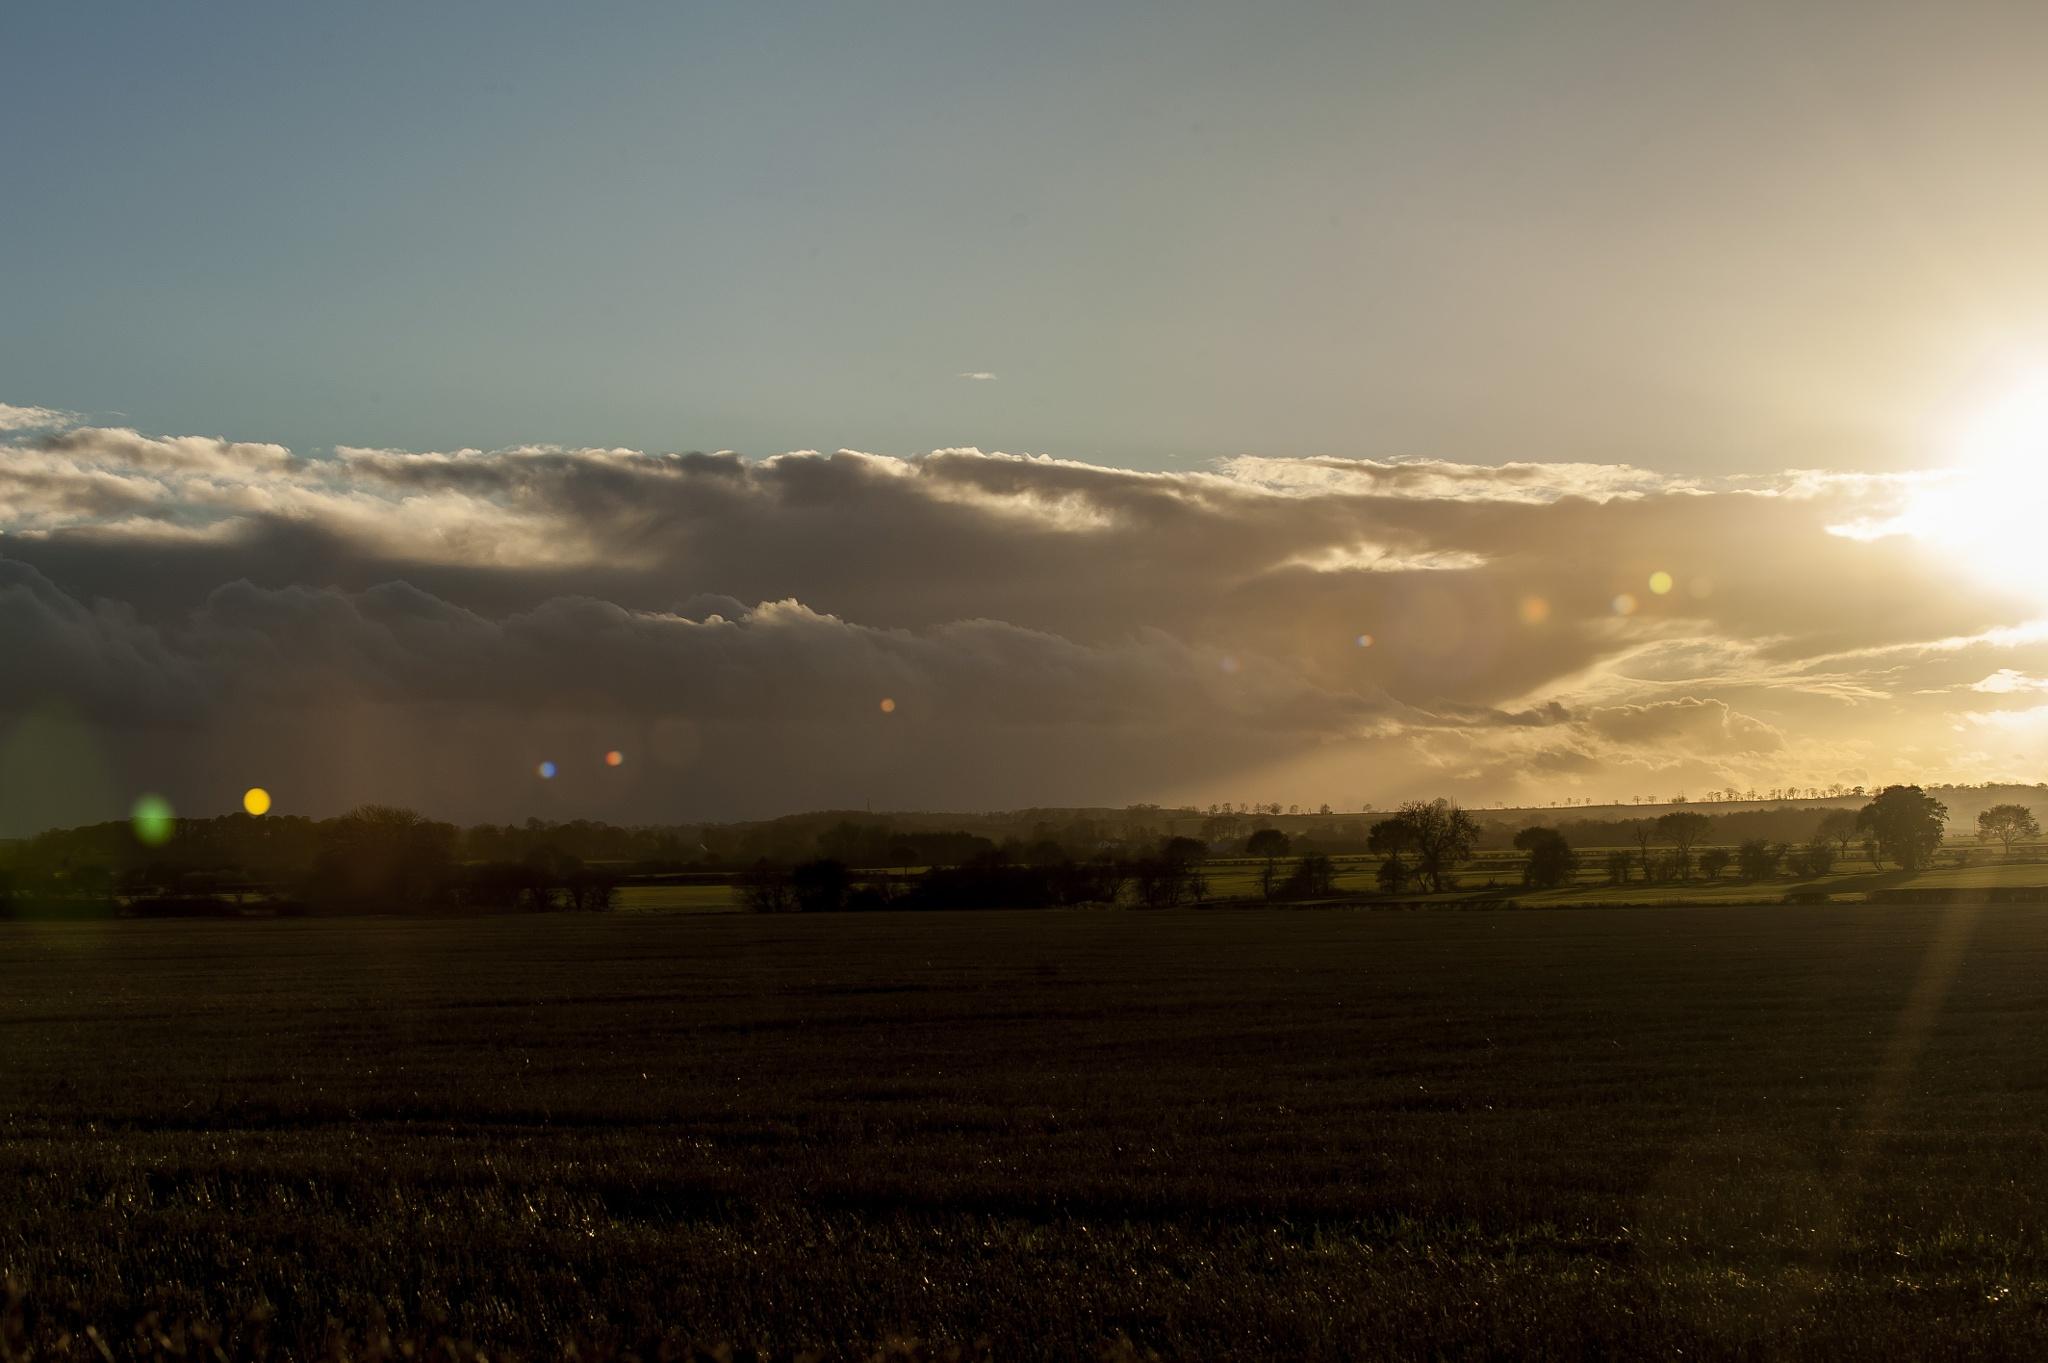 Rutland Evening by Pete Feeny